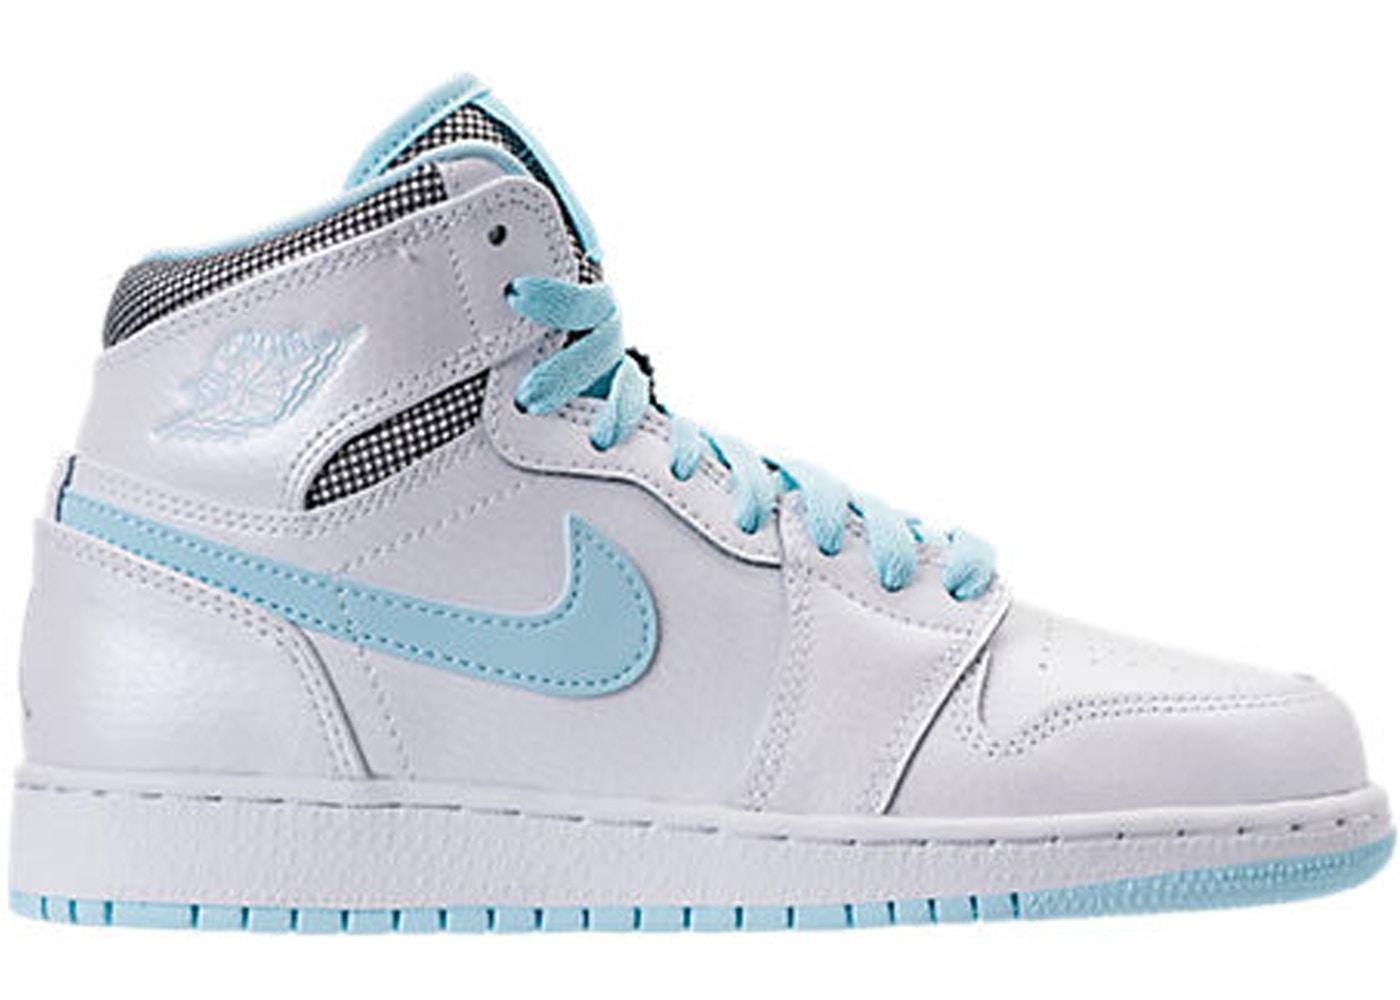 Jordan 1 Retro High White Still Blue (GS)